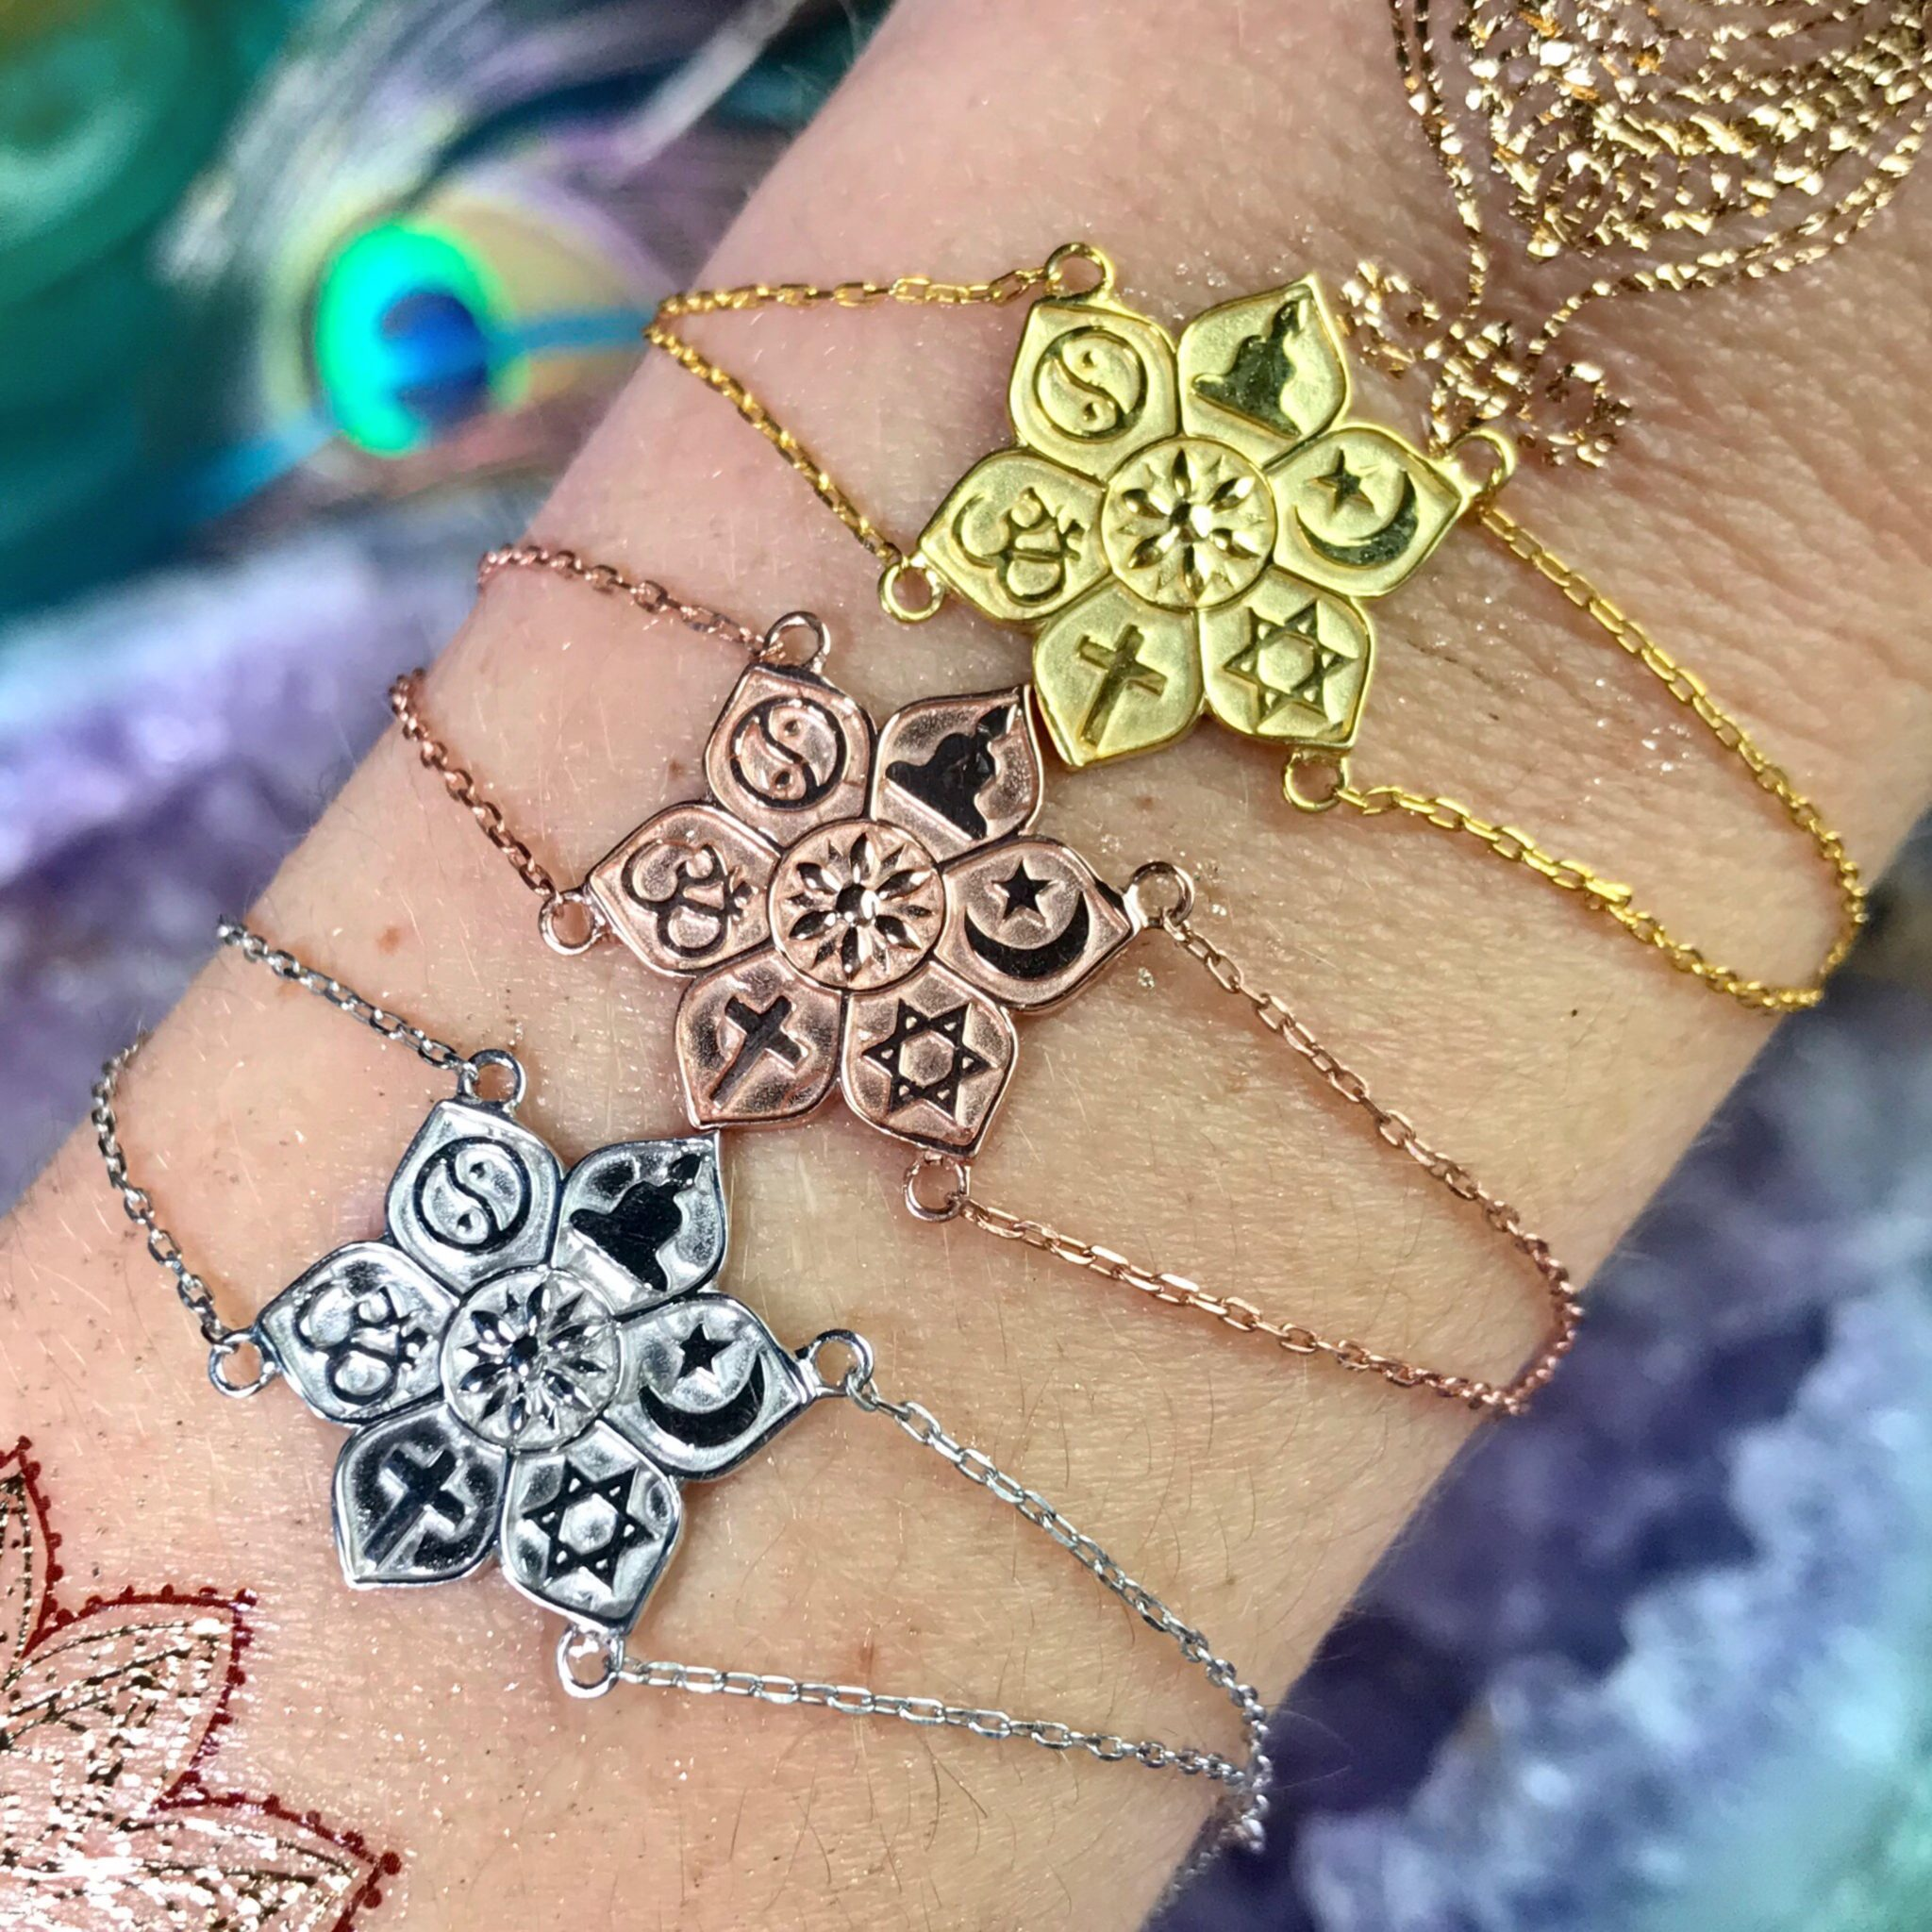 Lot of 3 Coexist bracelets Coexist Bracelets